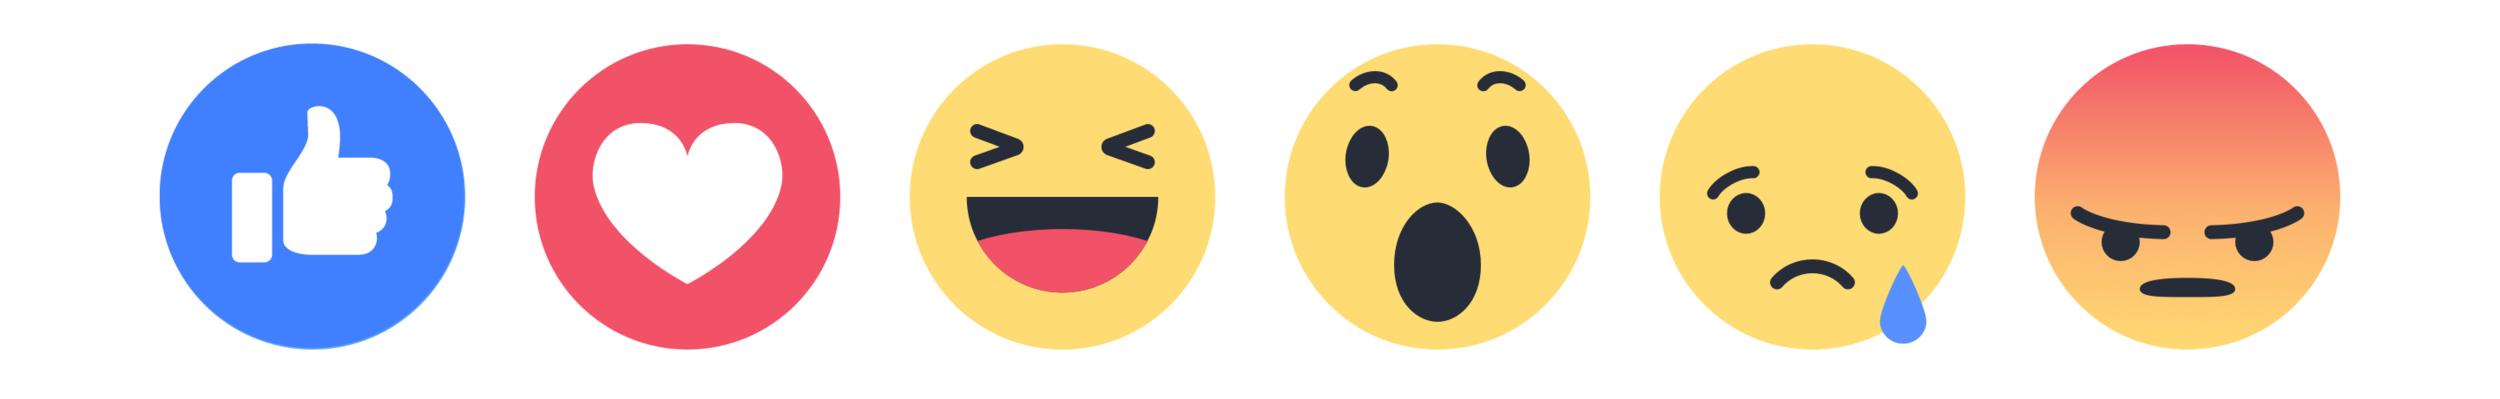 Reactions No Labels.png